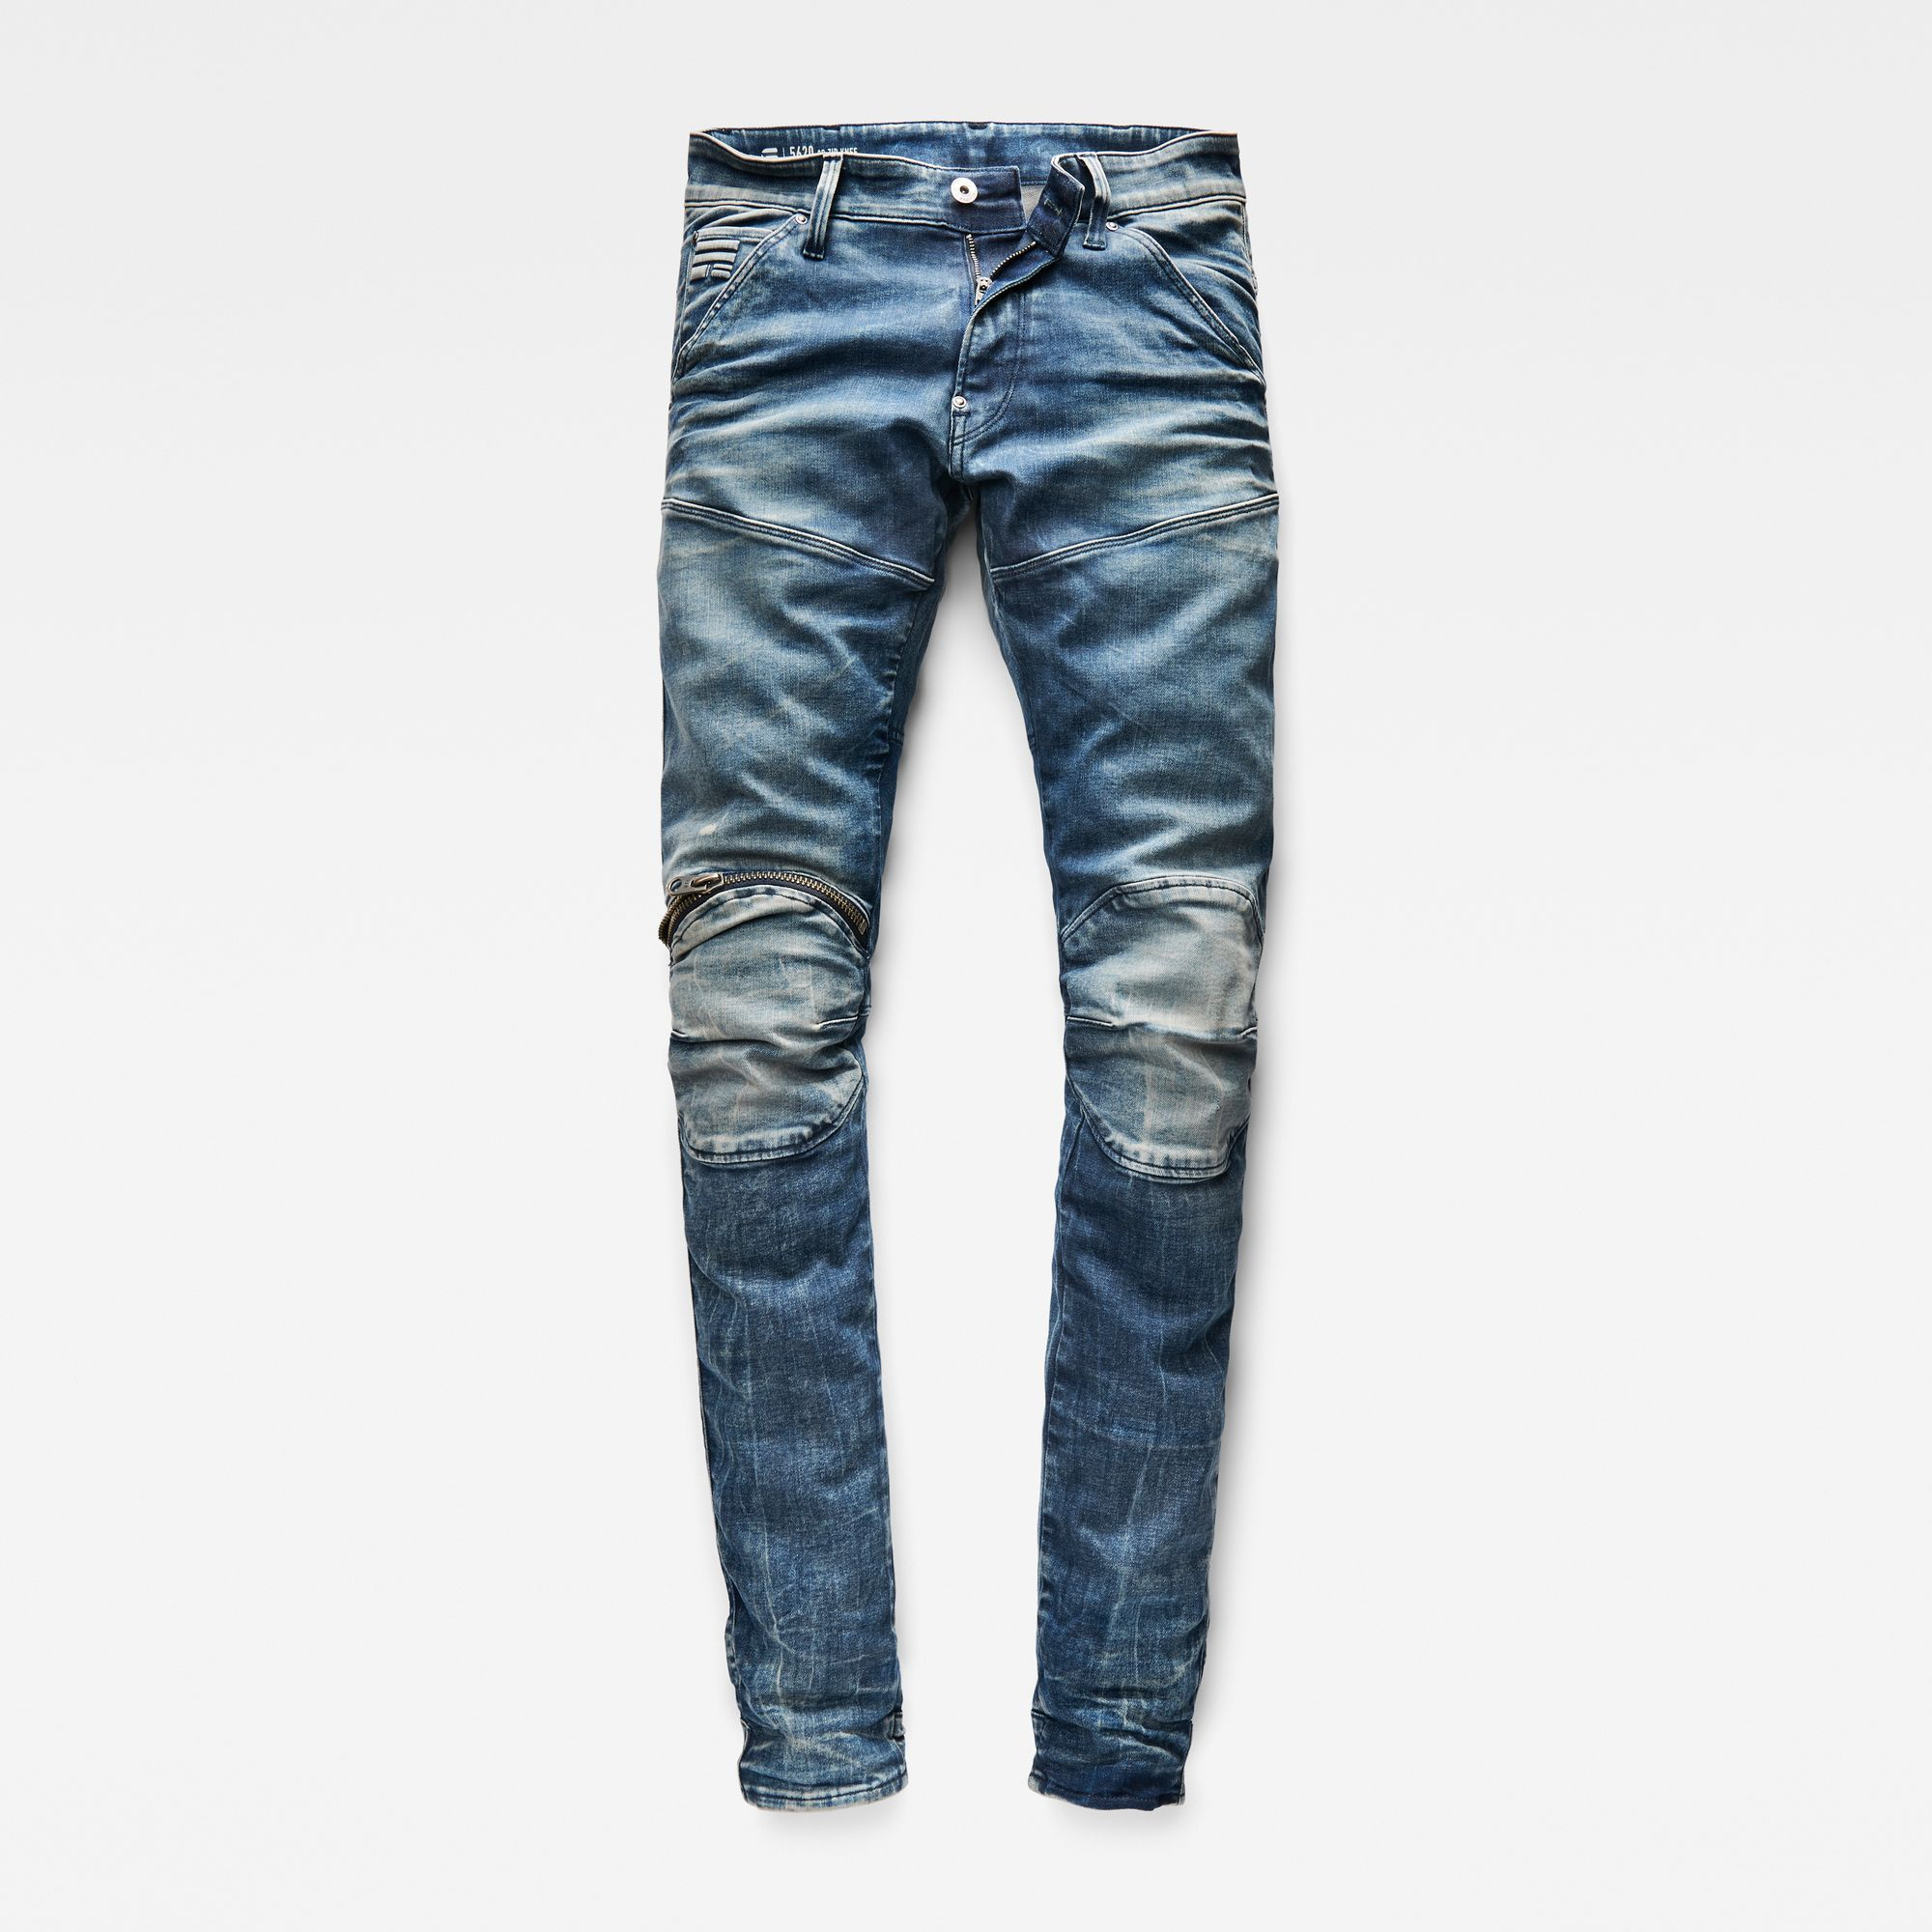 5620 3D Zip Knee Skinny Jeans | Jeans, Skinny jeans, Men dress